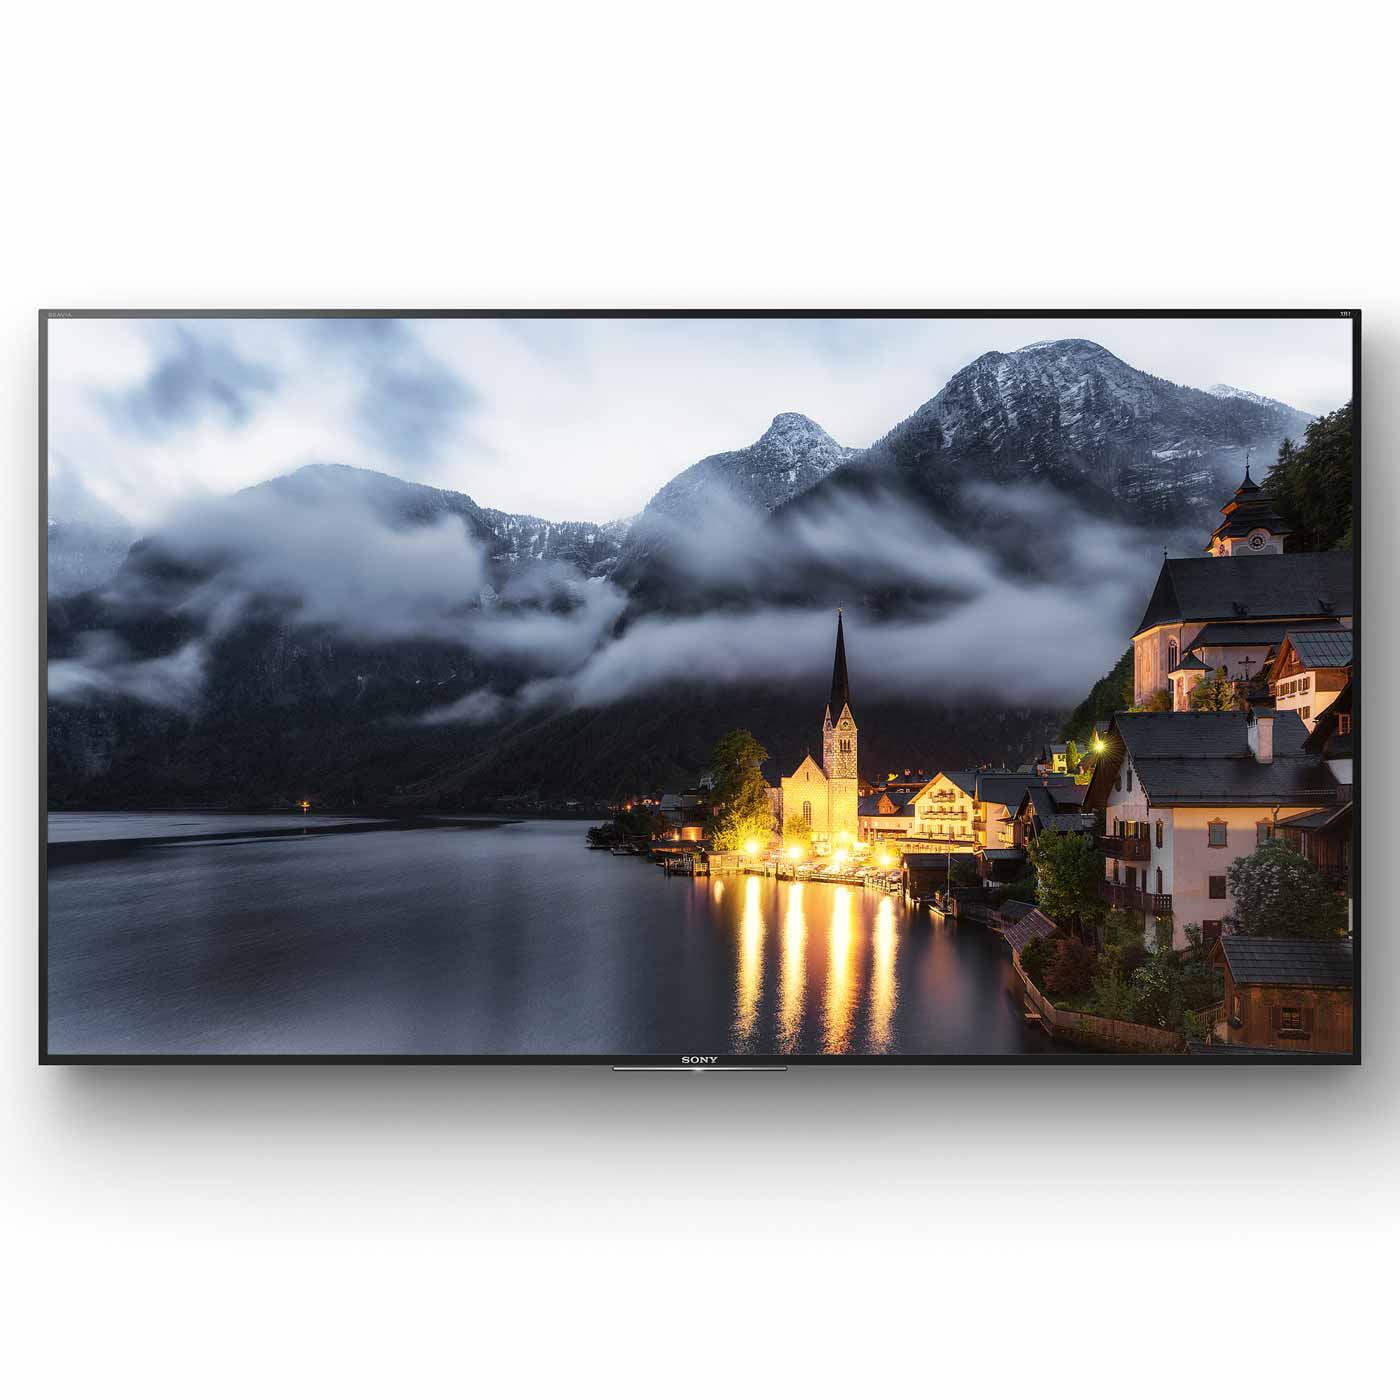 "Sony 49"" Class 4K (2160P) Smart LED TV (XBR49X900E) by Sony"